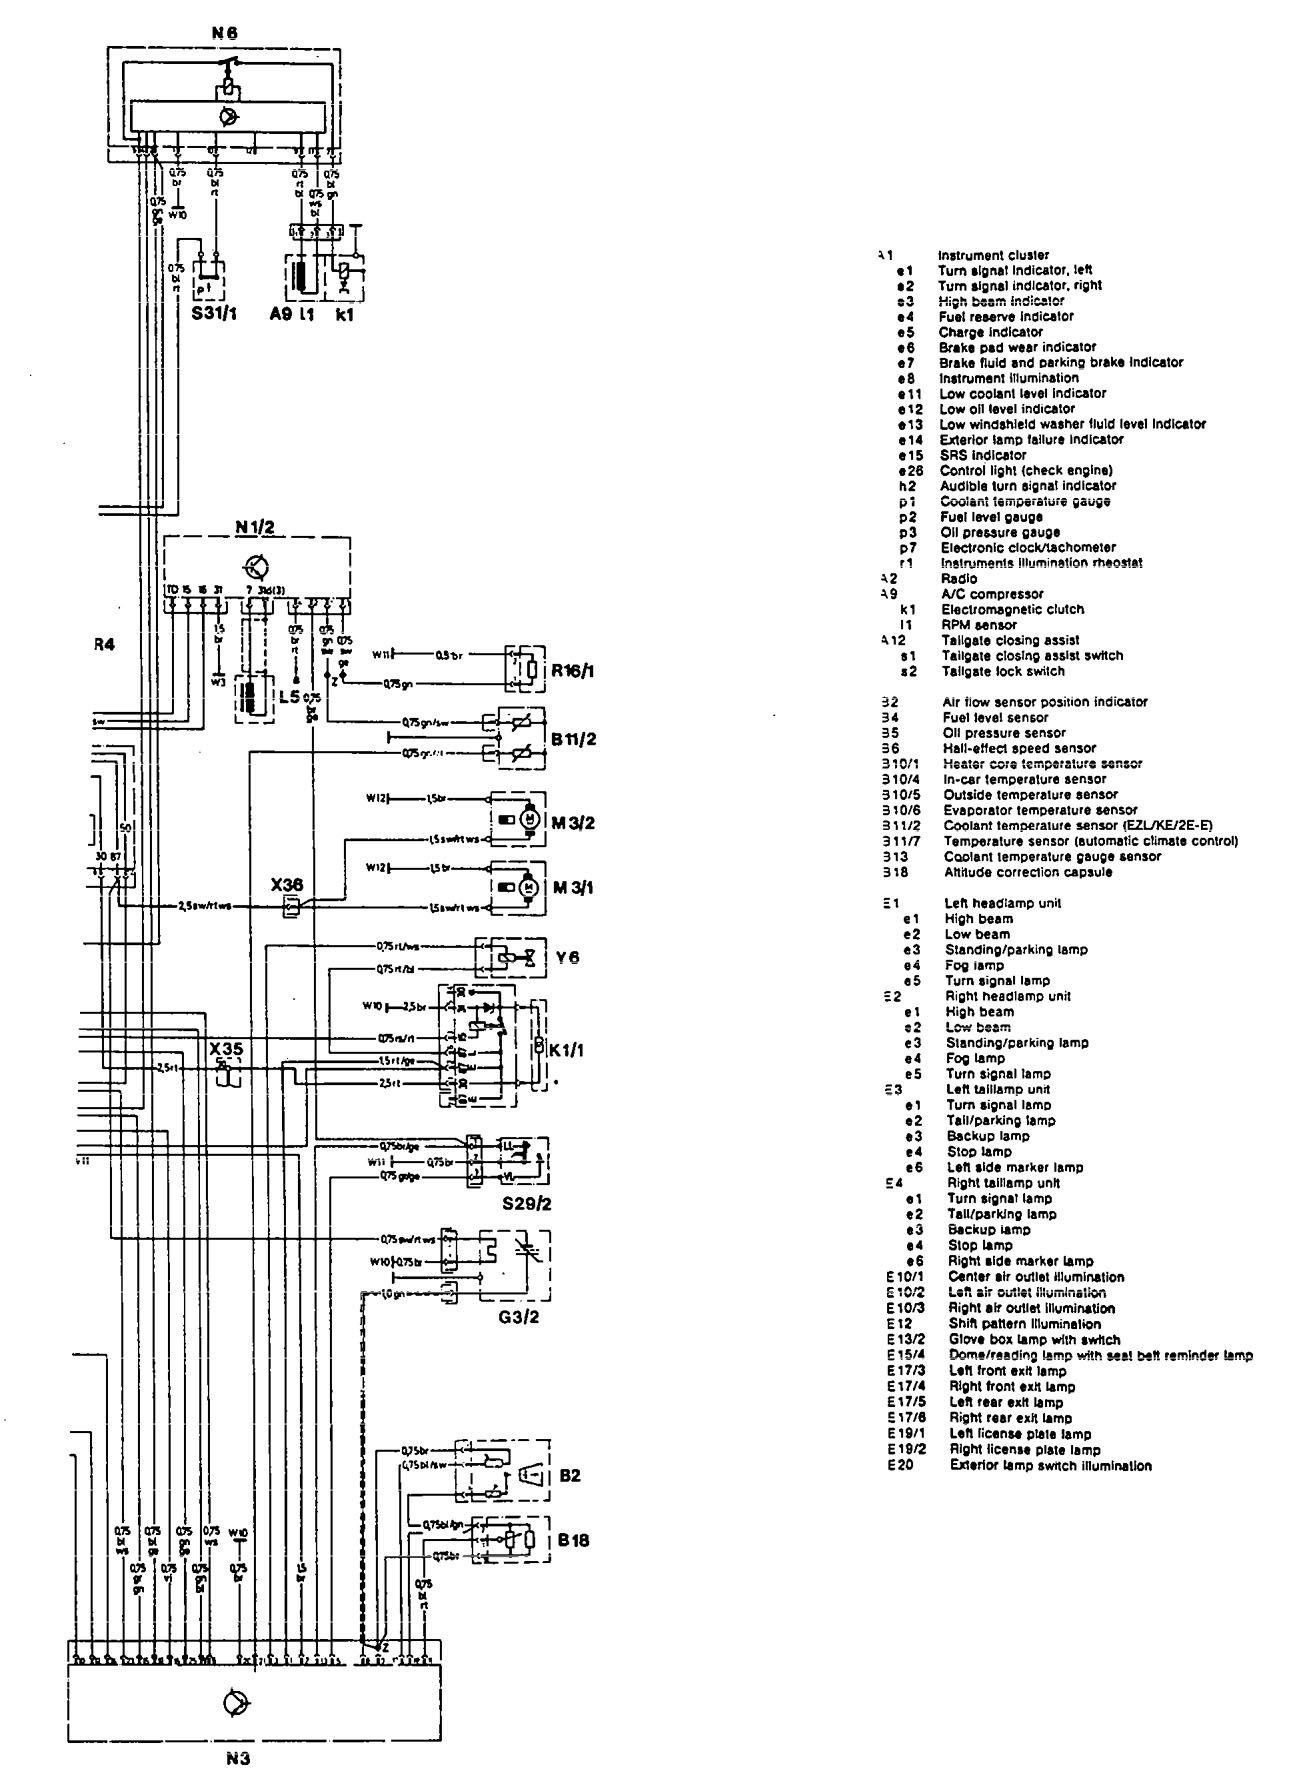 Mercedes Benz 300te 1992 1993 Wiring Diagrams Cooling Fans Fan Diagram